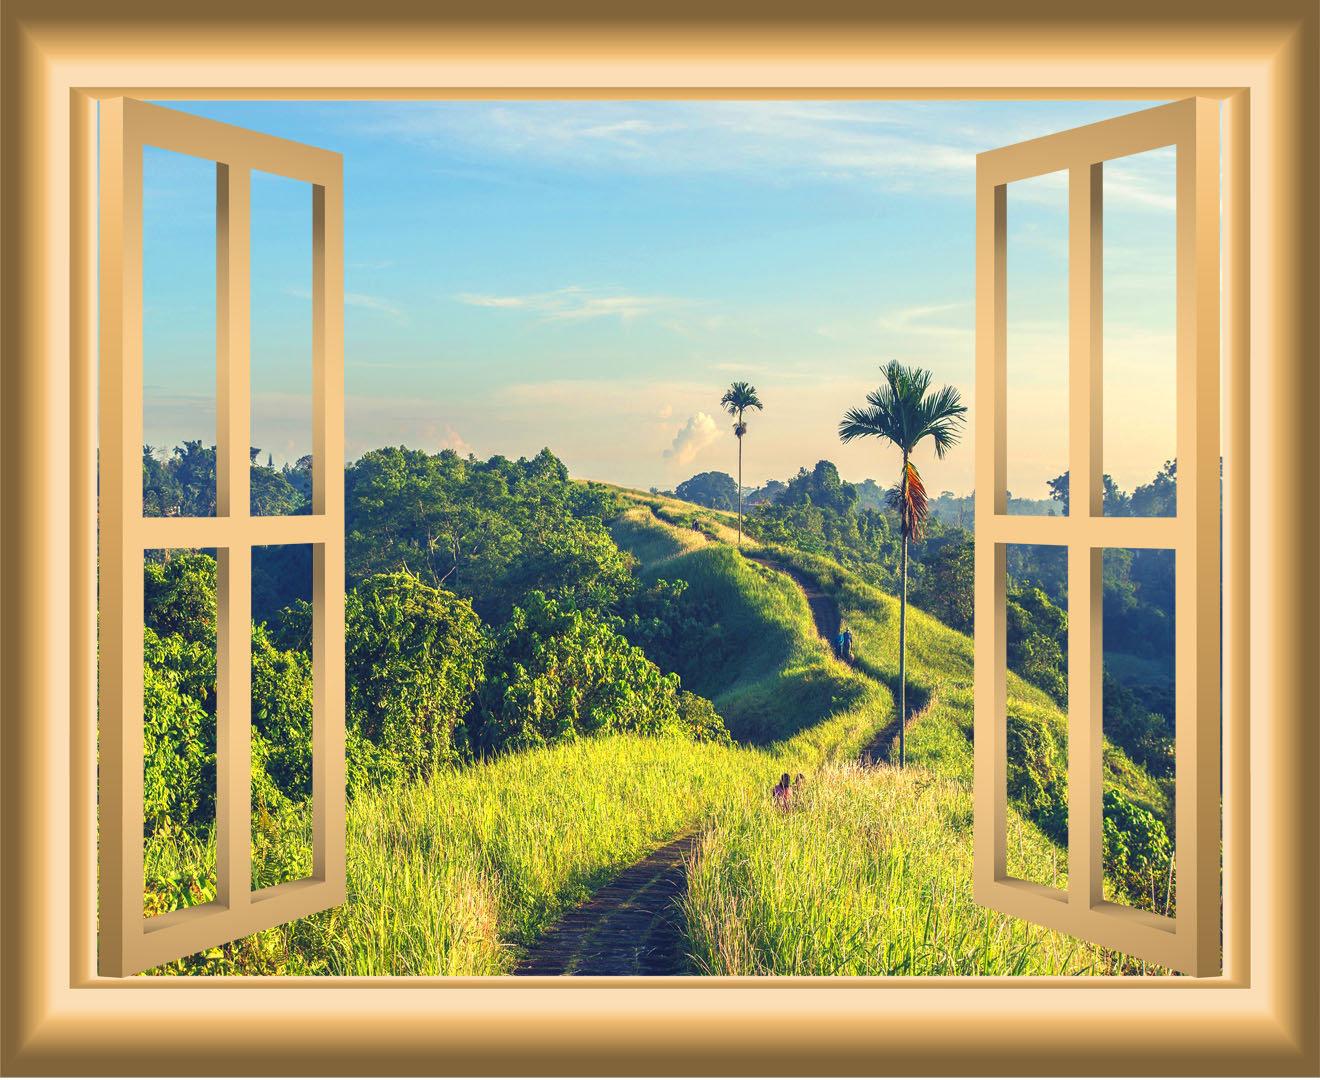 East Urban Home 3D Nature Field Window Wall Decal | Wayfair